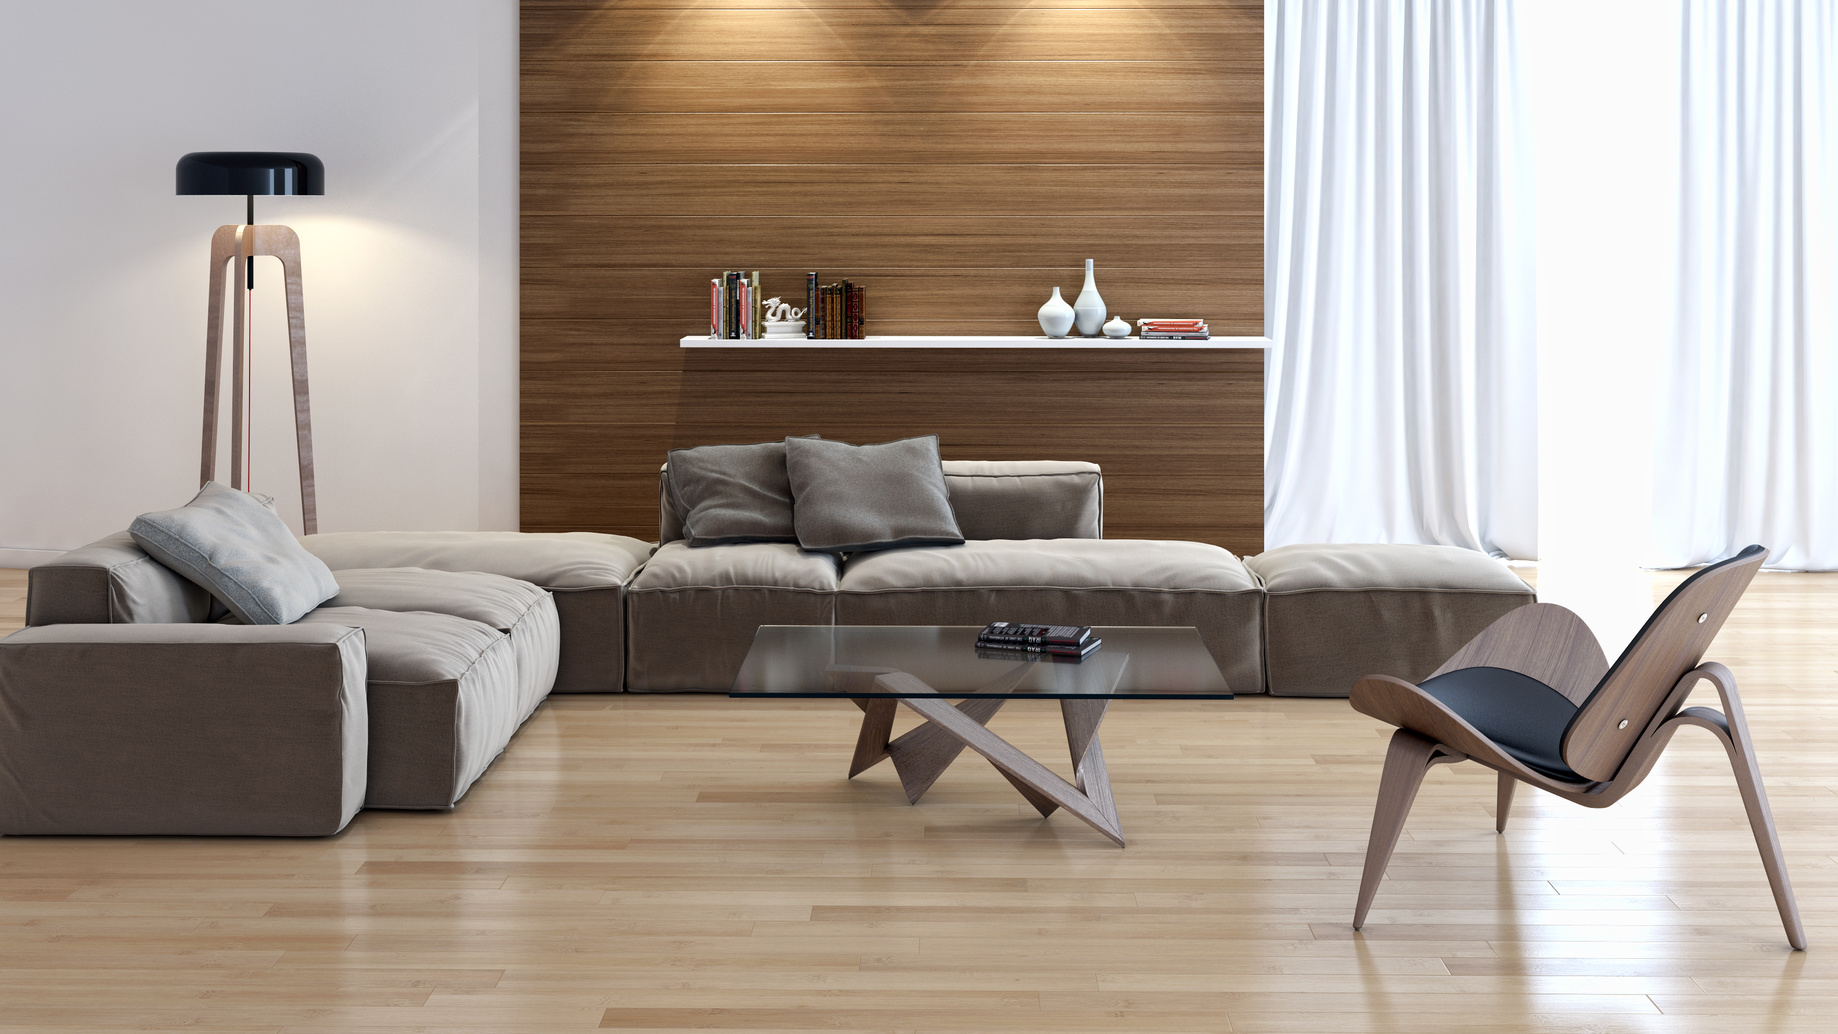 Aislamiento termico interior paredes latest imare - Aislamiento de paredes ...